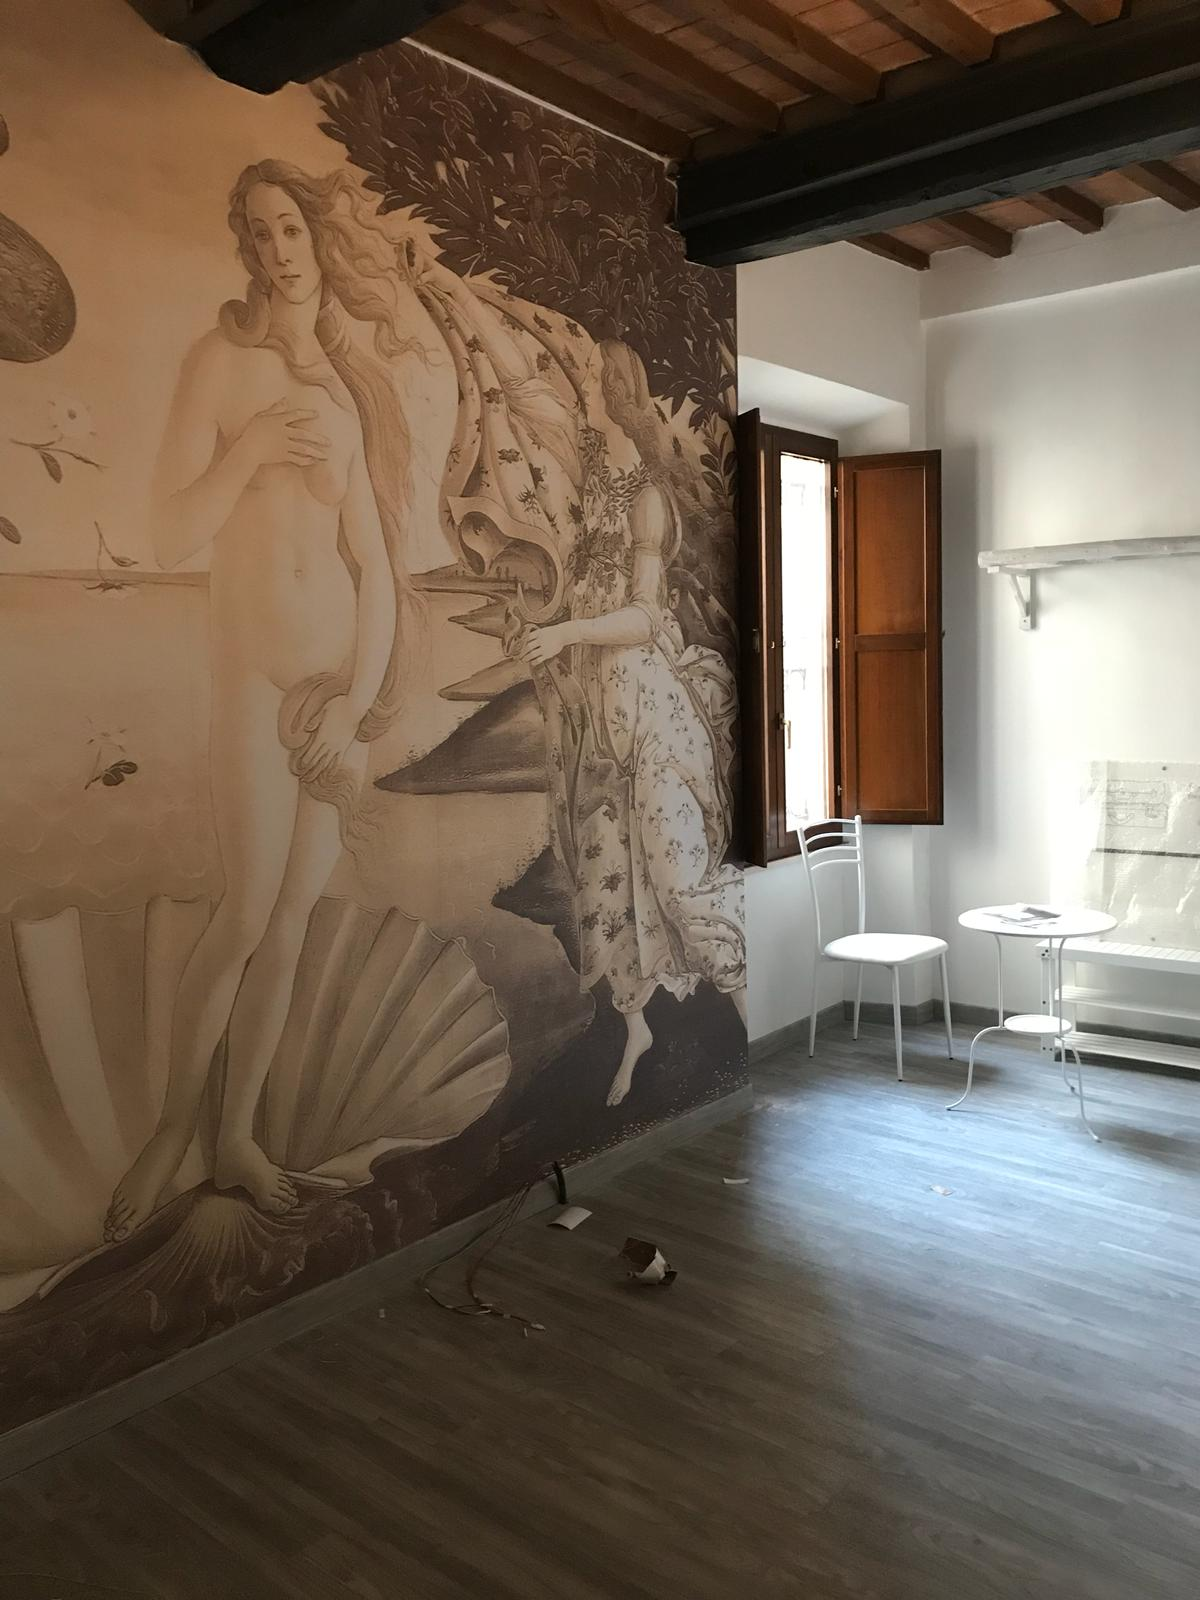 7-tuscan-history-guest-house-rehbuild-news.jpg